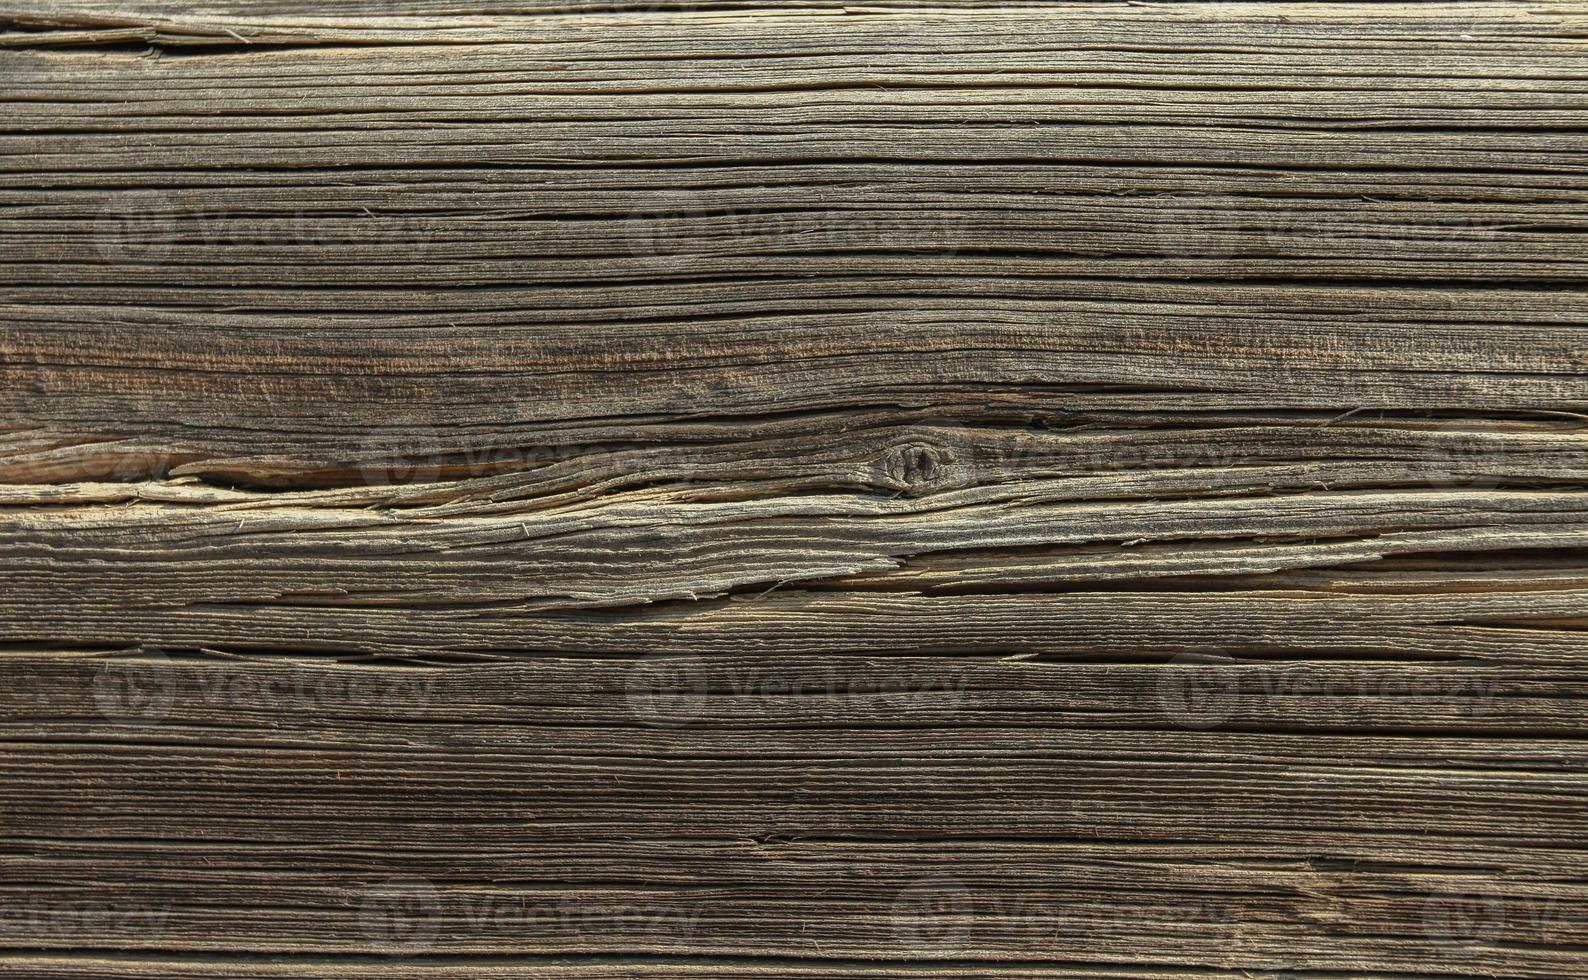 viejo fondo de paneles de madera foto